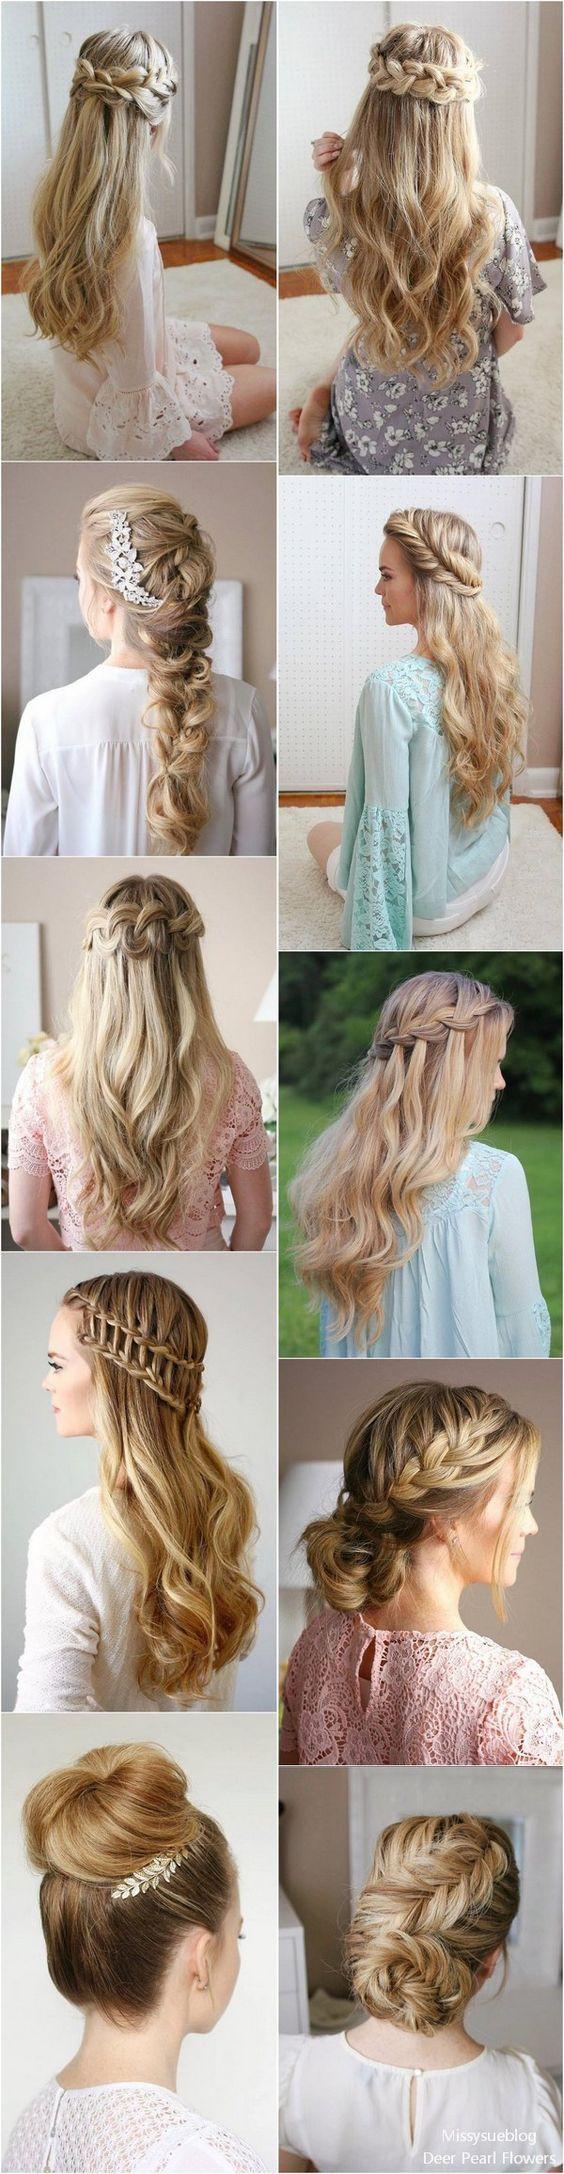 Beckham hairstyle name braided hairstyle headband pinterest